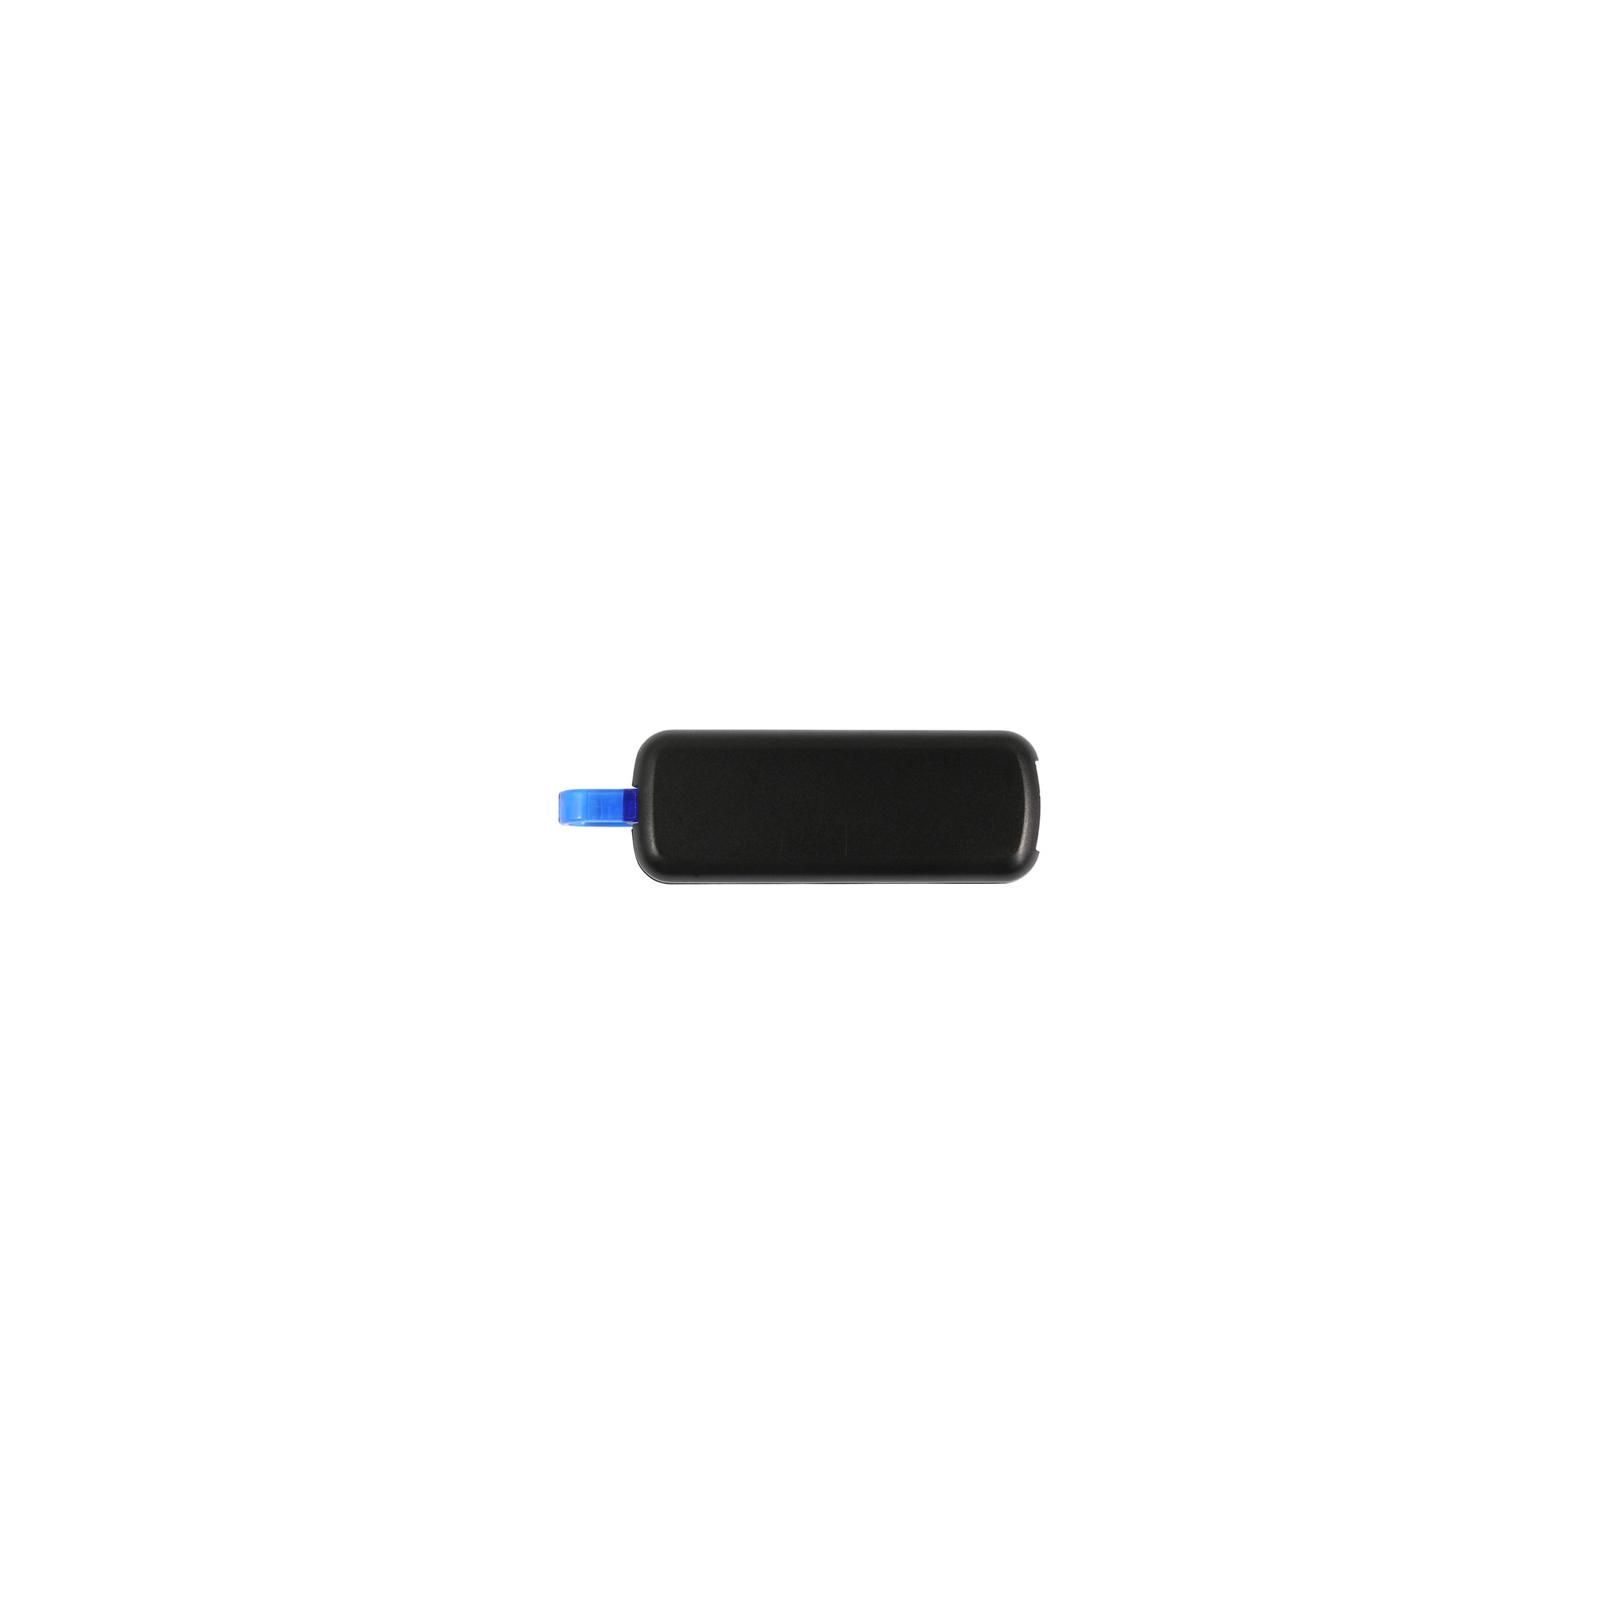 USB флеш накопитель 16GB AH354 Black RP USB3.0 Apacer (AP16GAH354B-1) изображение 2